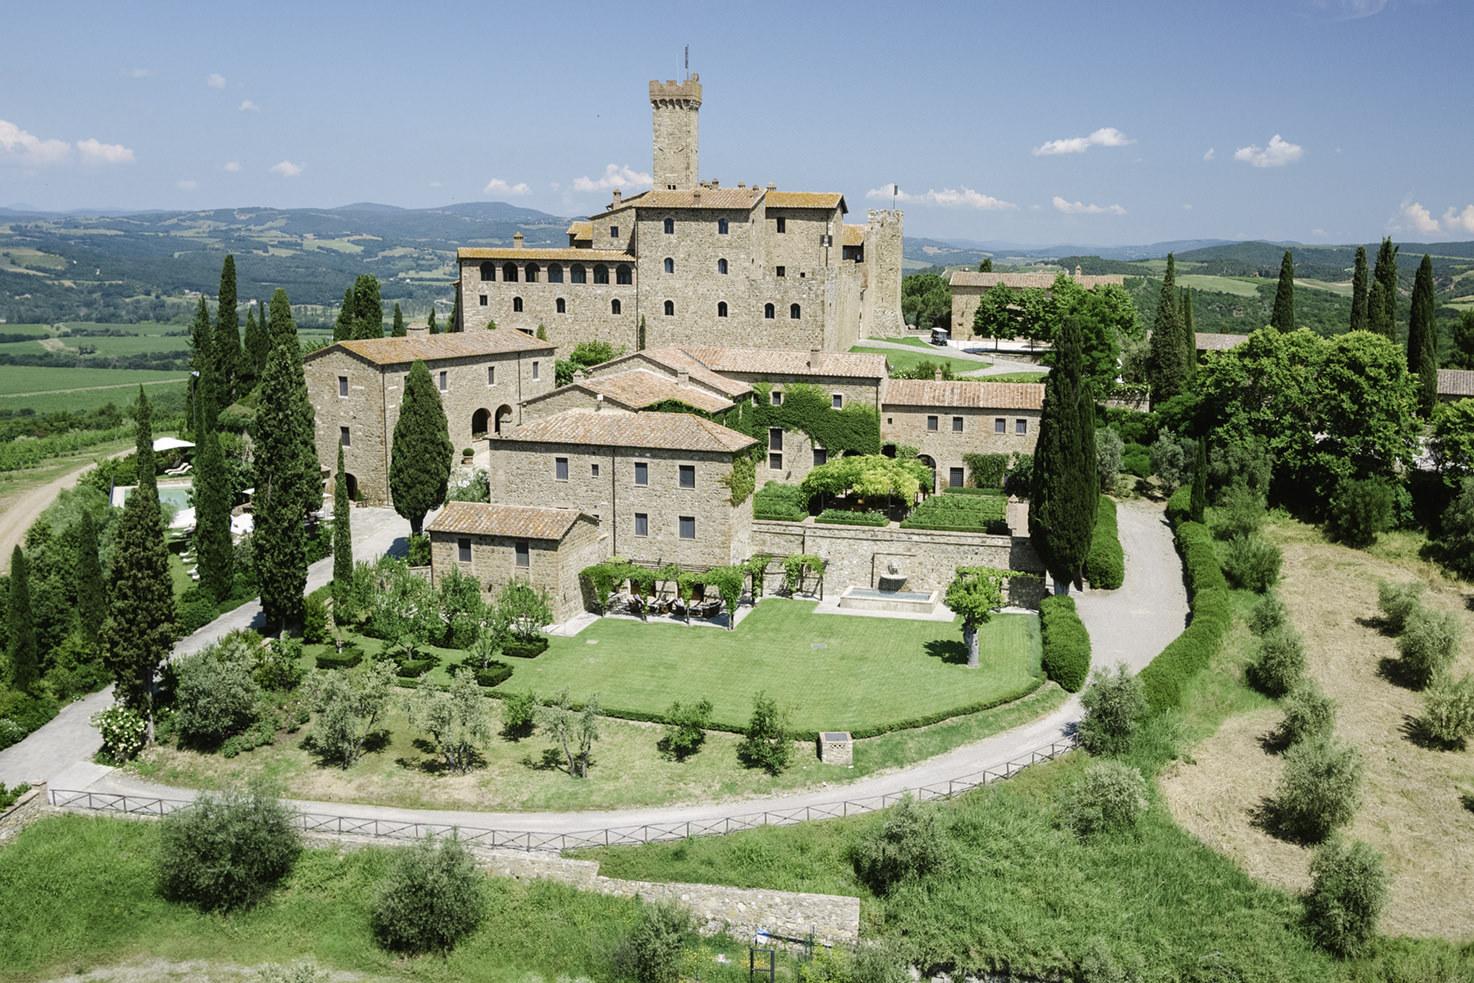 Overview of Castello Banfi near Montalcino